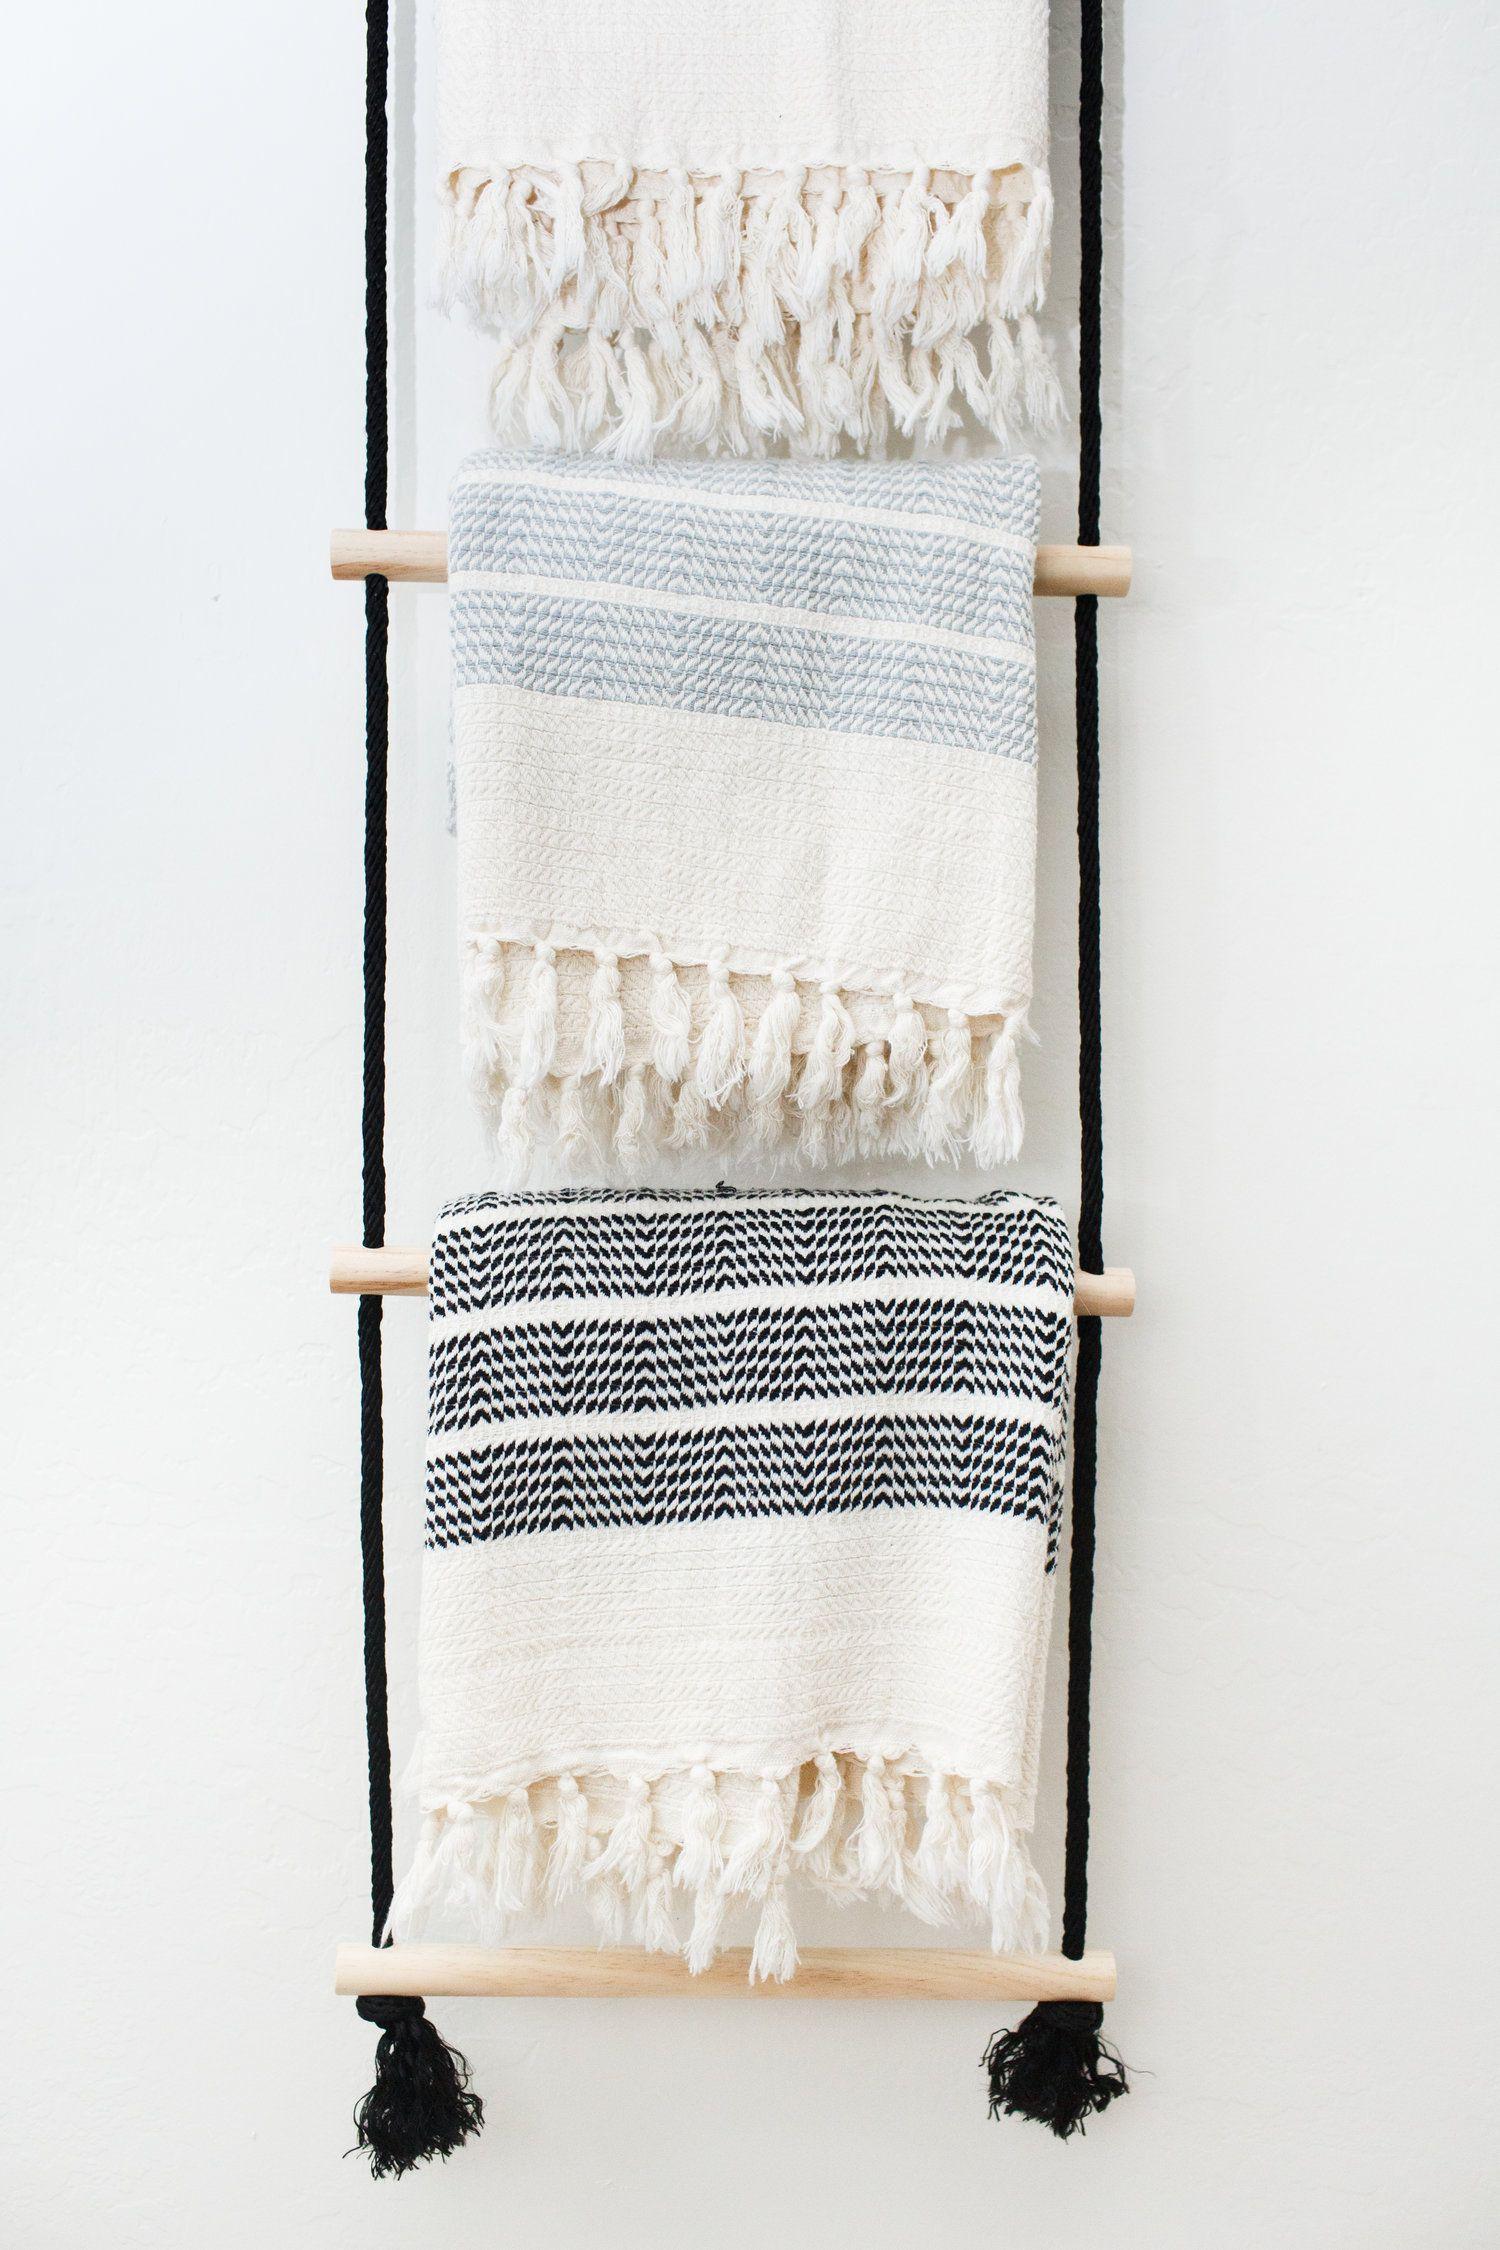 Diy Hanging Ladder Ave Styles Diy Towel Rack Hanging Ladder Diy Towels